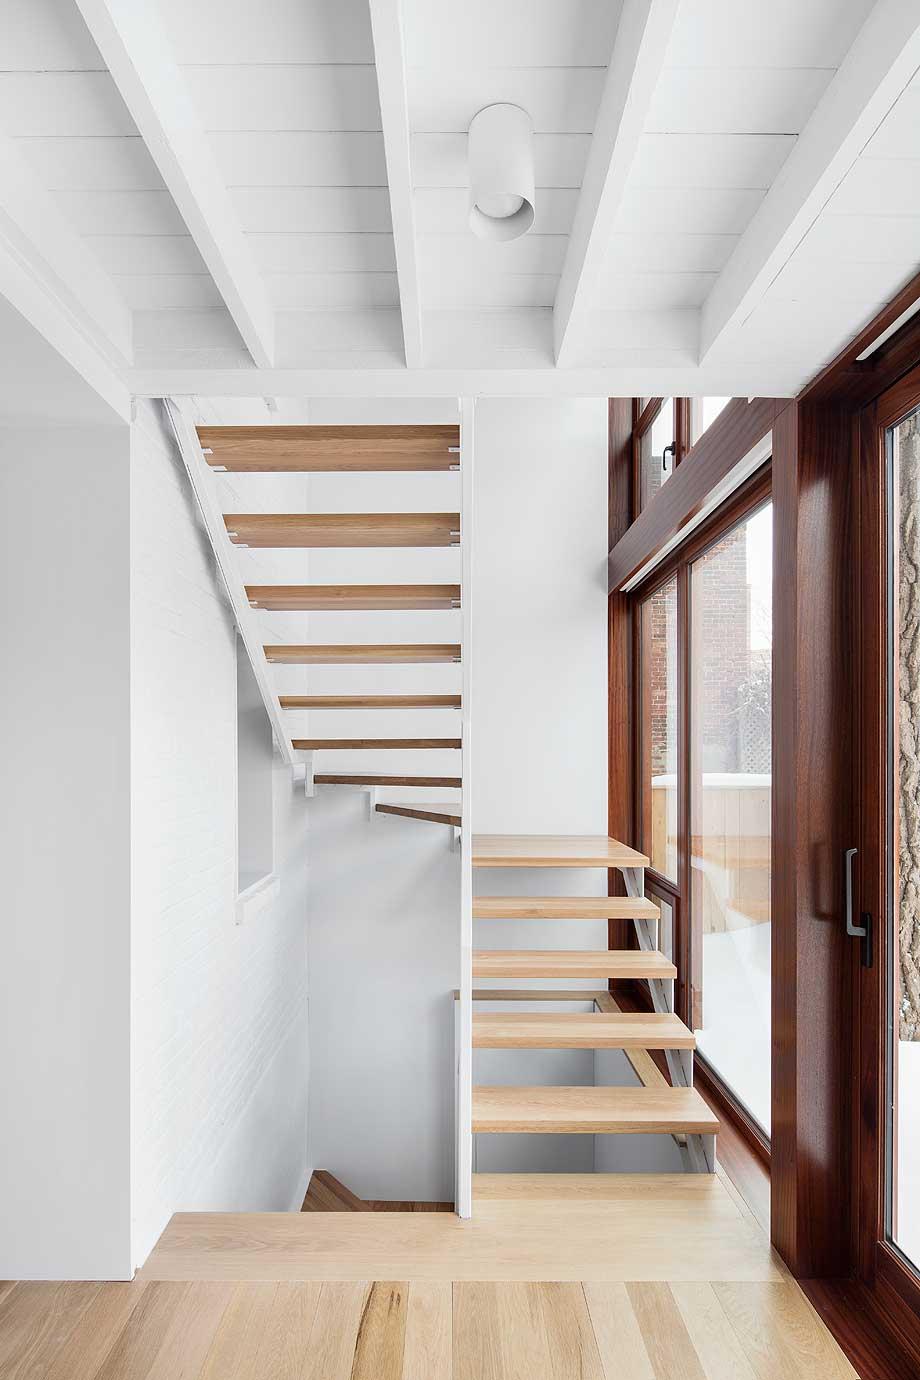 hotel-de-ville-residence-architecture-microclimat (4)